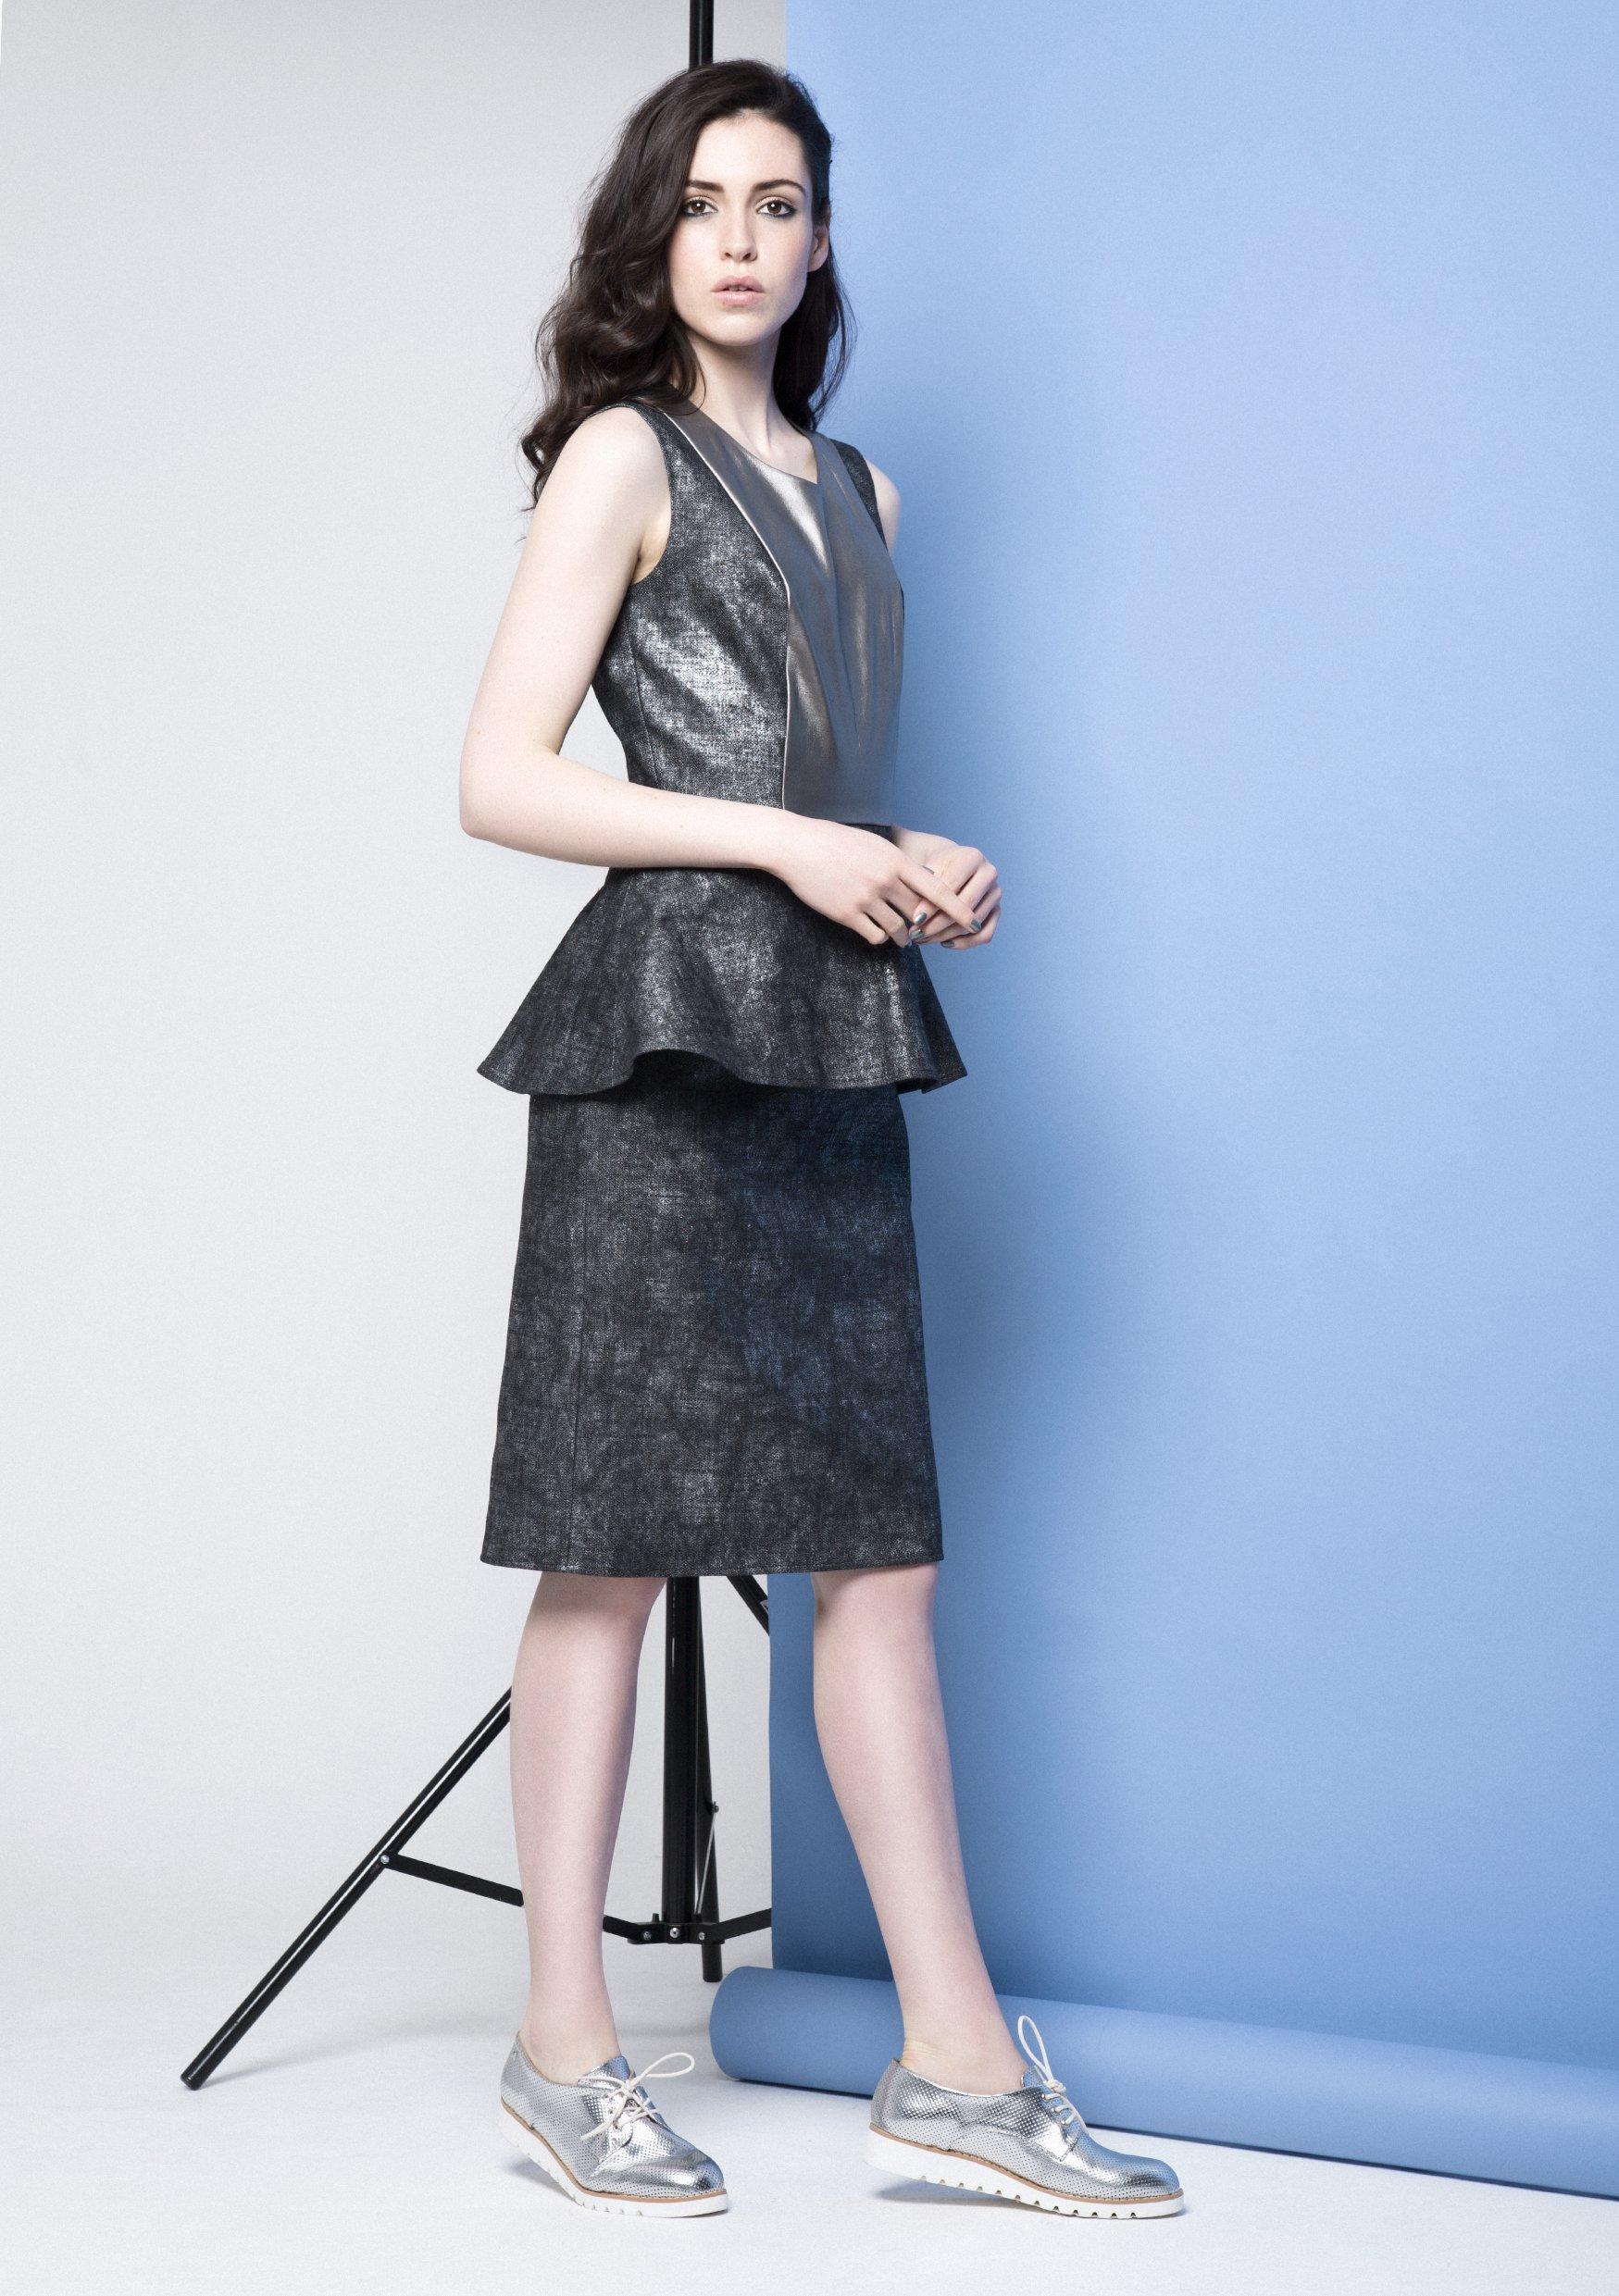 Manley AW15 Lexi Leather Dress €340.jpg